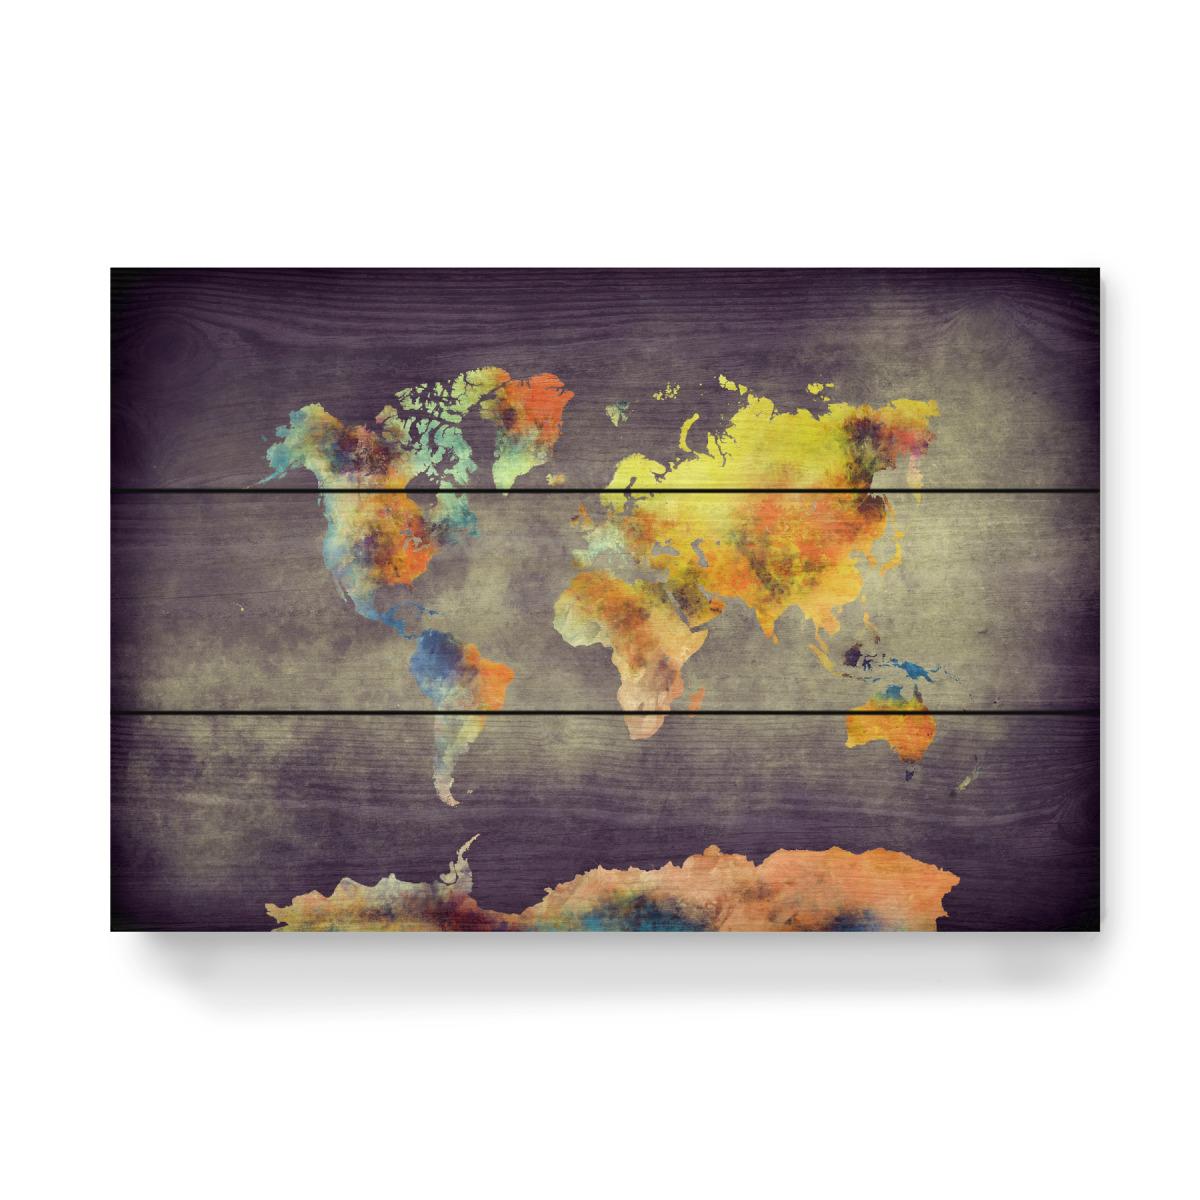 world map 28 after war als Holzbild bei artboxONE kaufen